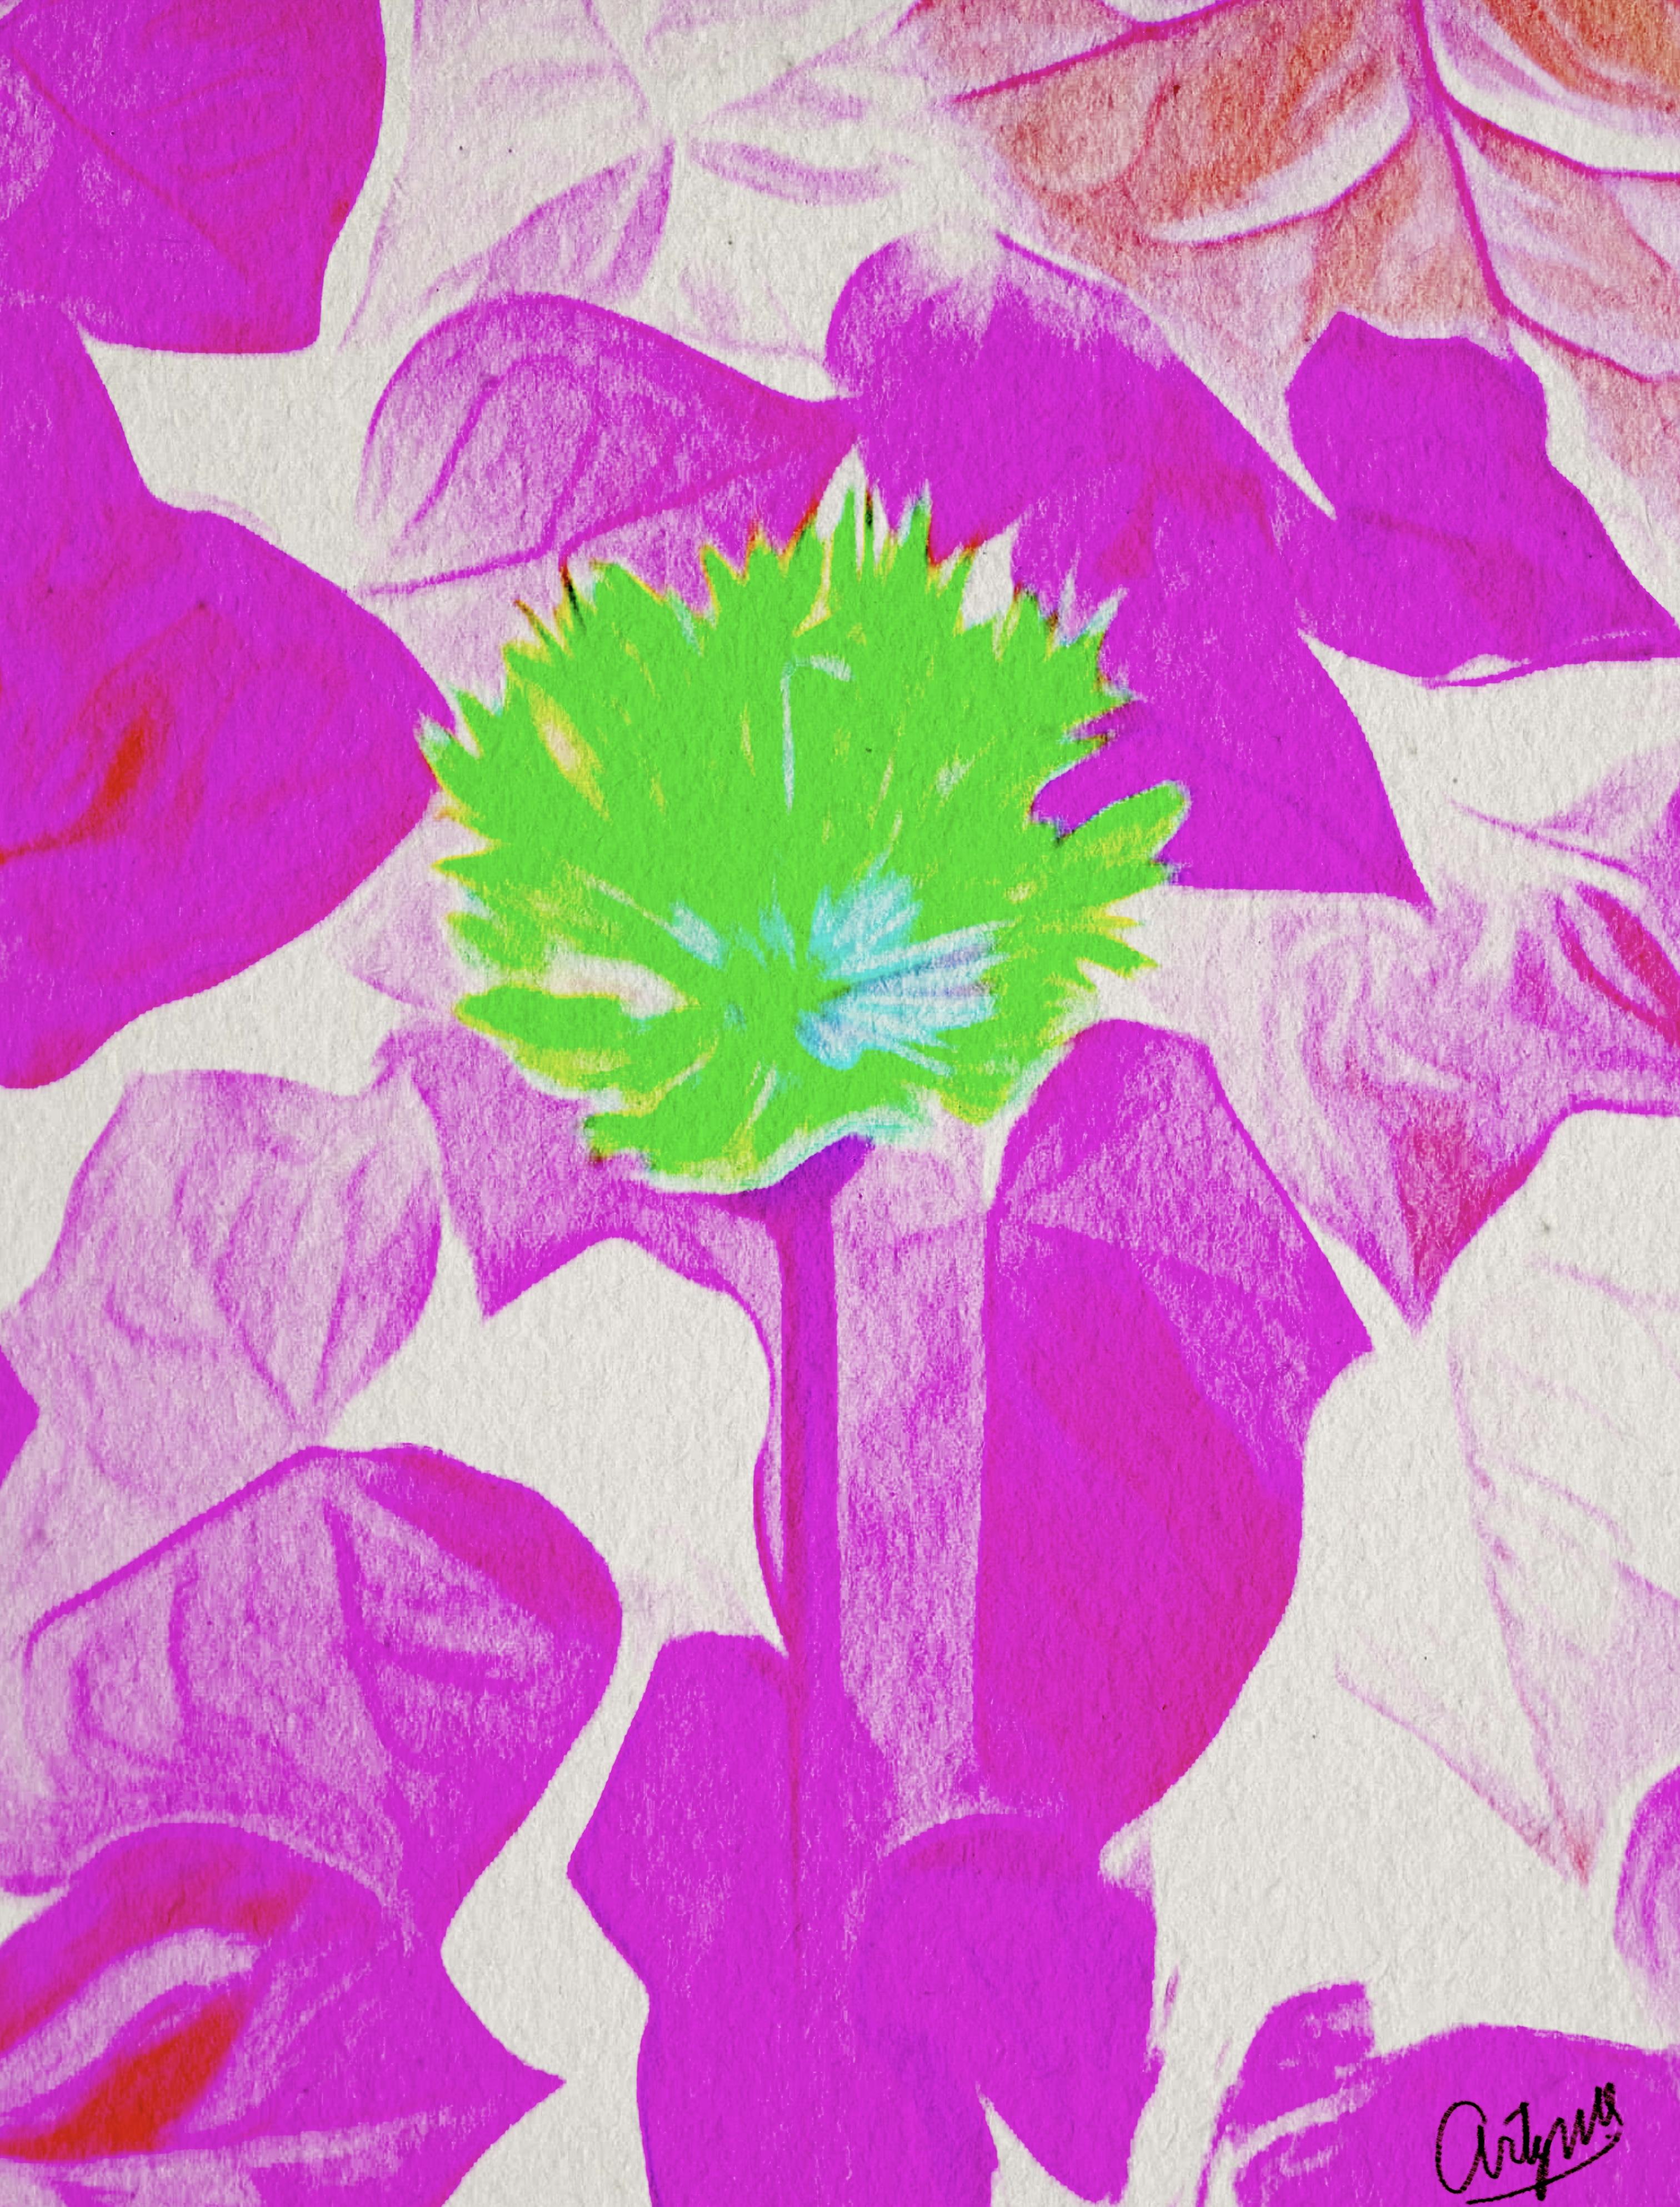 Flowers garden creative beautiful photography art artwork colours painting pink flower power